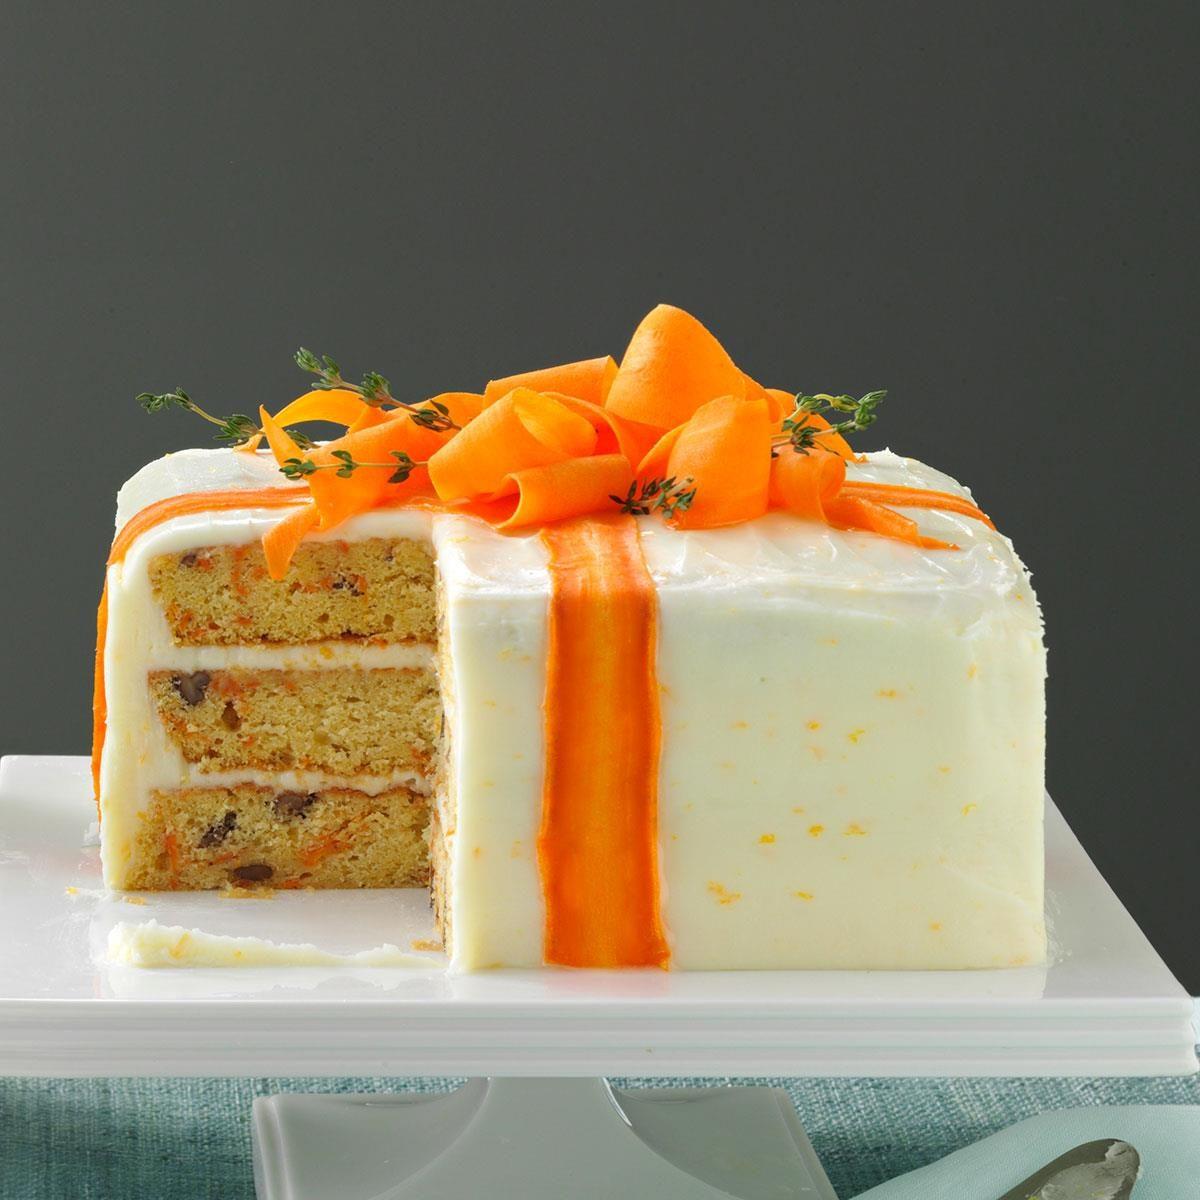 Design Of Carrot Cake : Three-Layered Carrot Cake Recipe Taste of Home